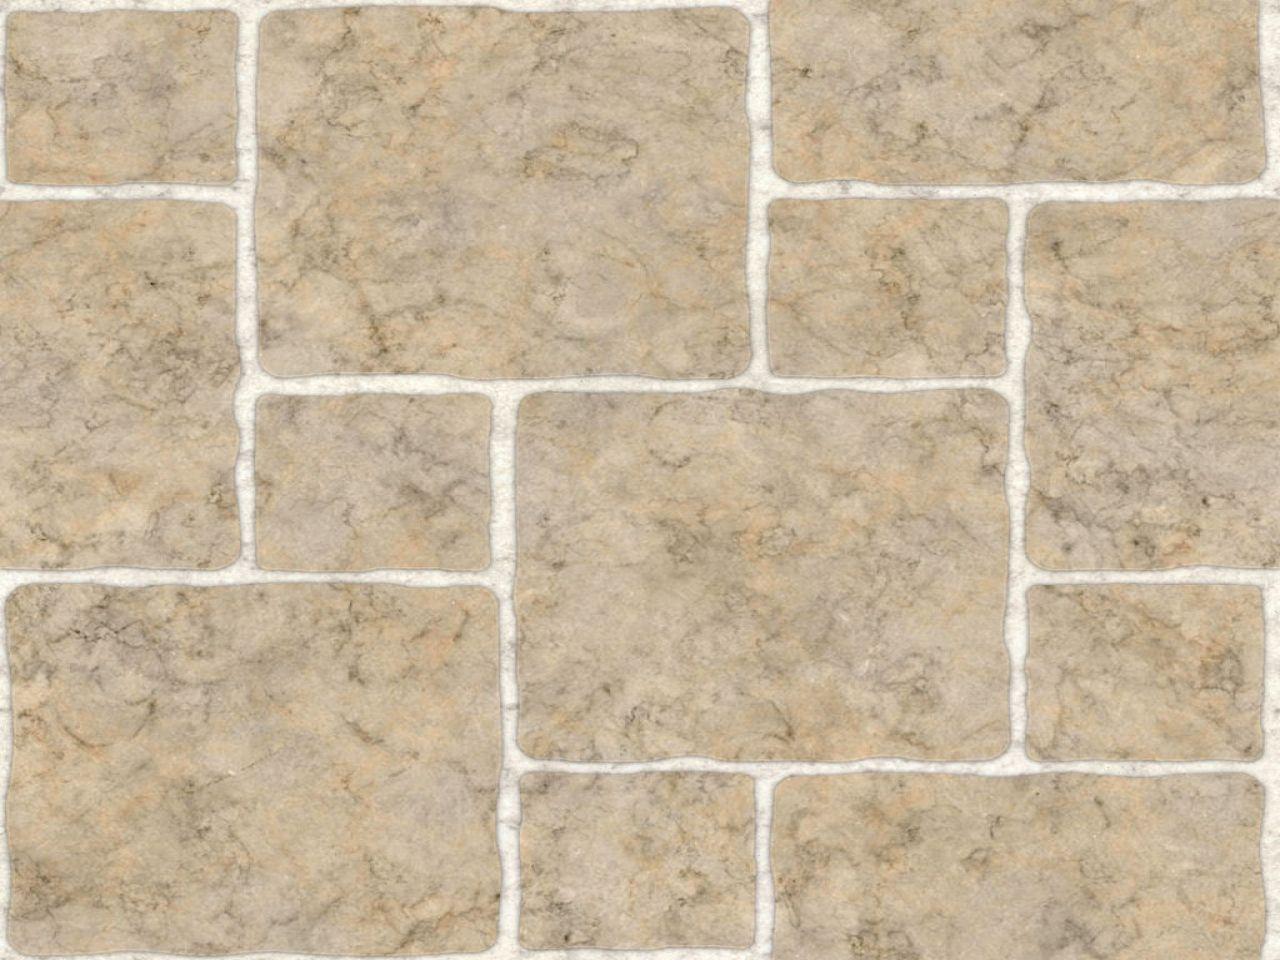 seamless-textures-floor-tile-ceramic-tile-textures-seamless